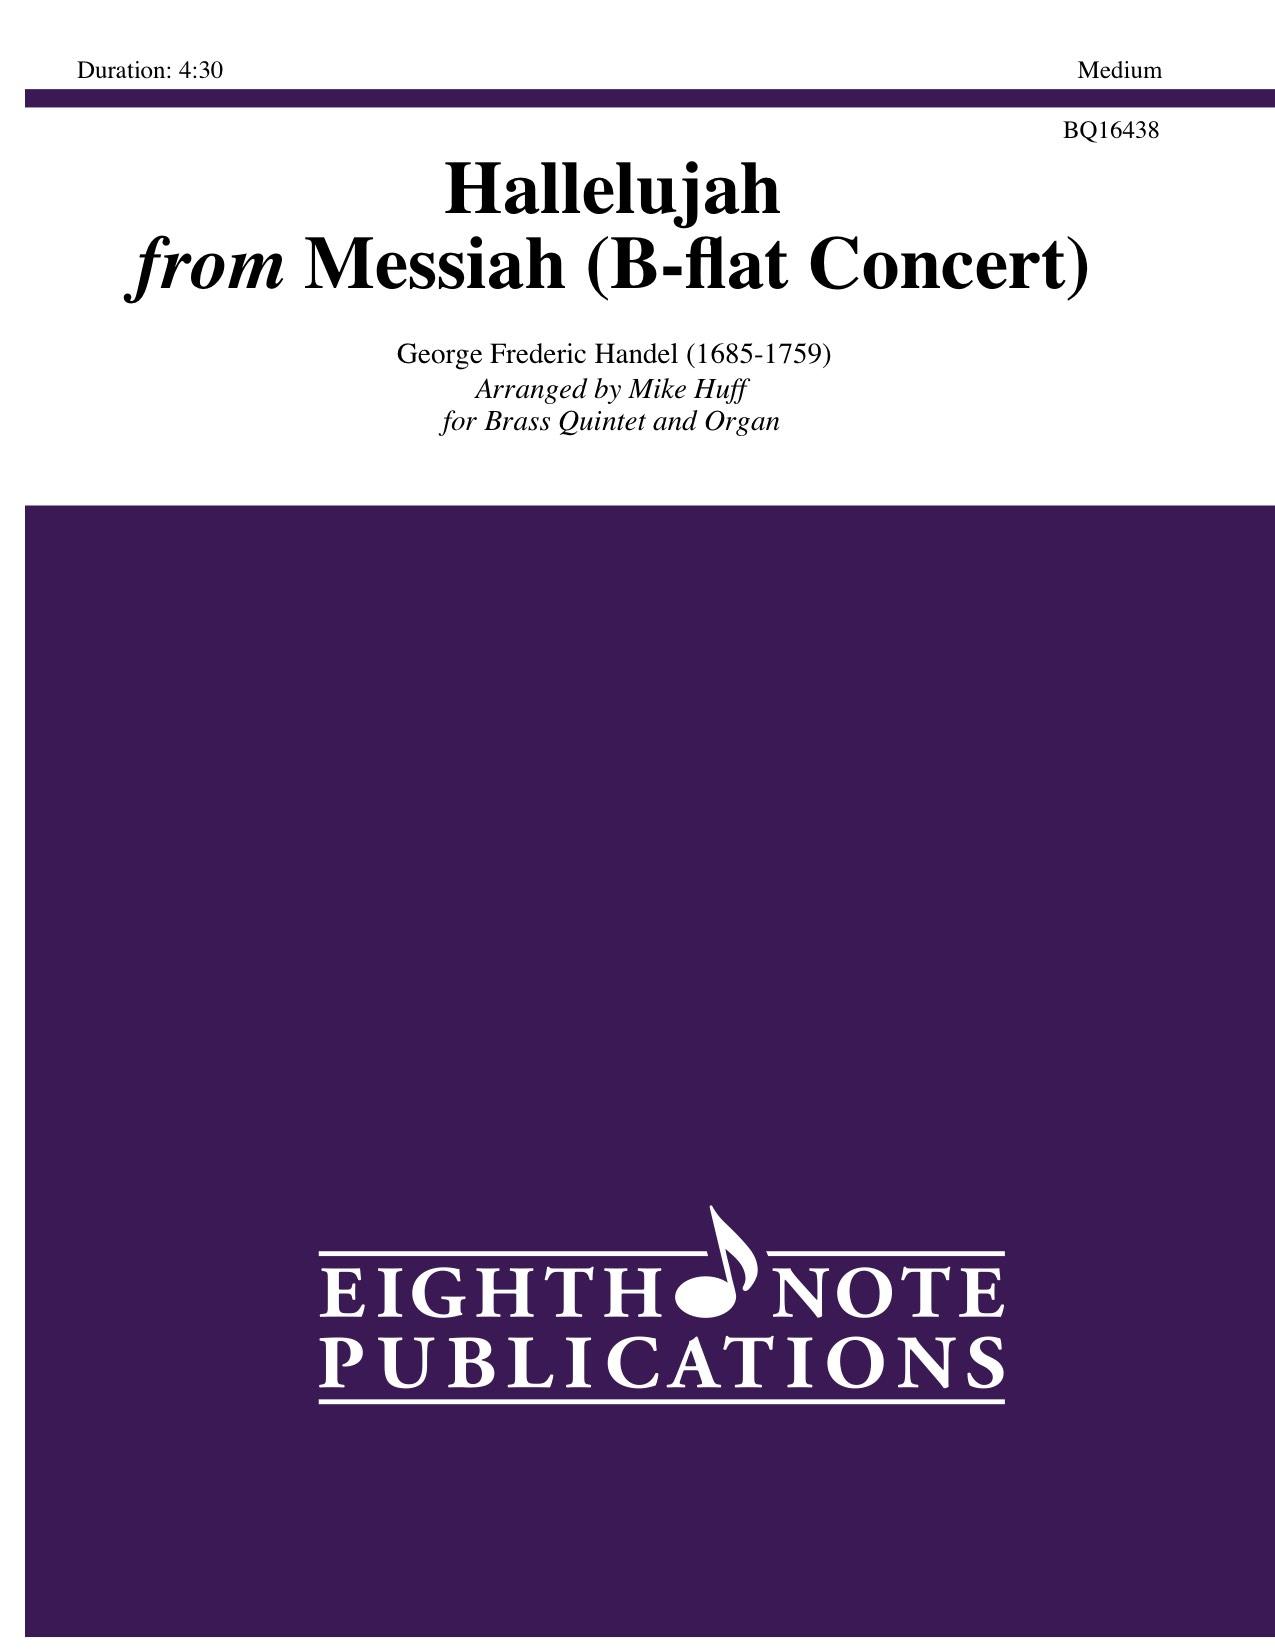 Hallelujah from Messiah - B-flat Concert - George Frederic Handel